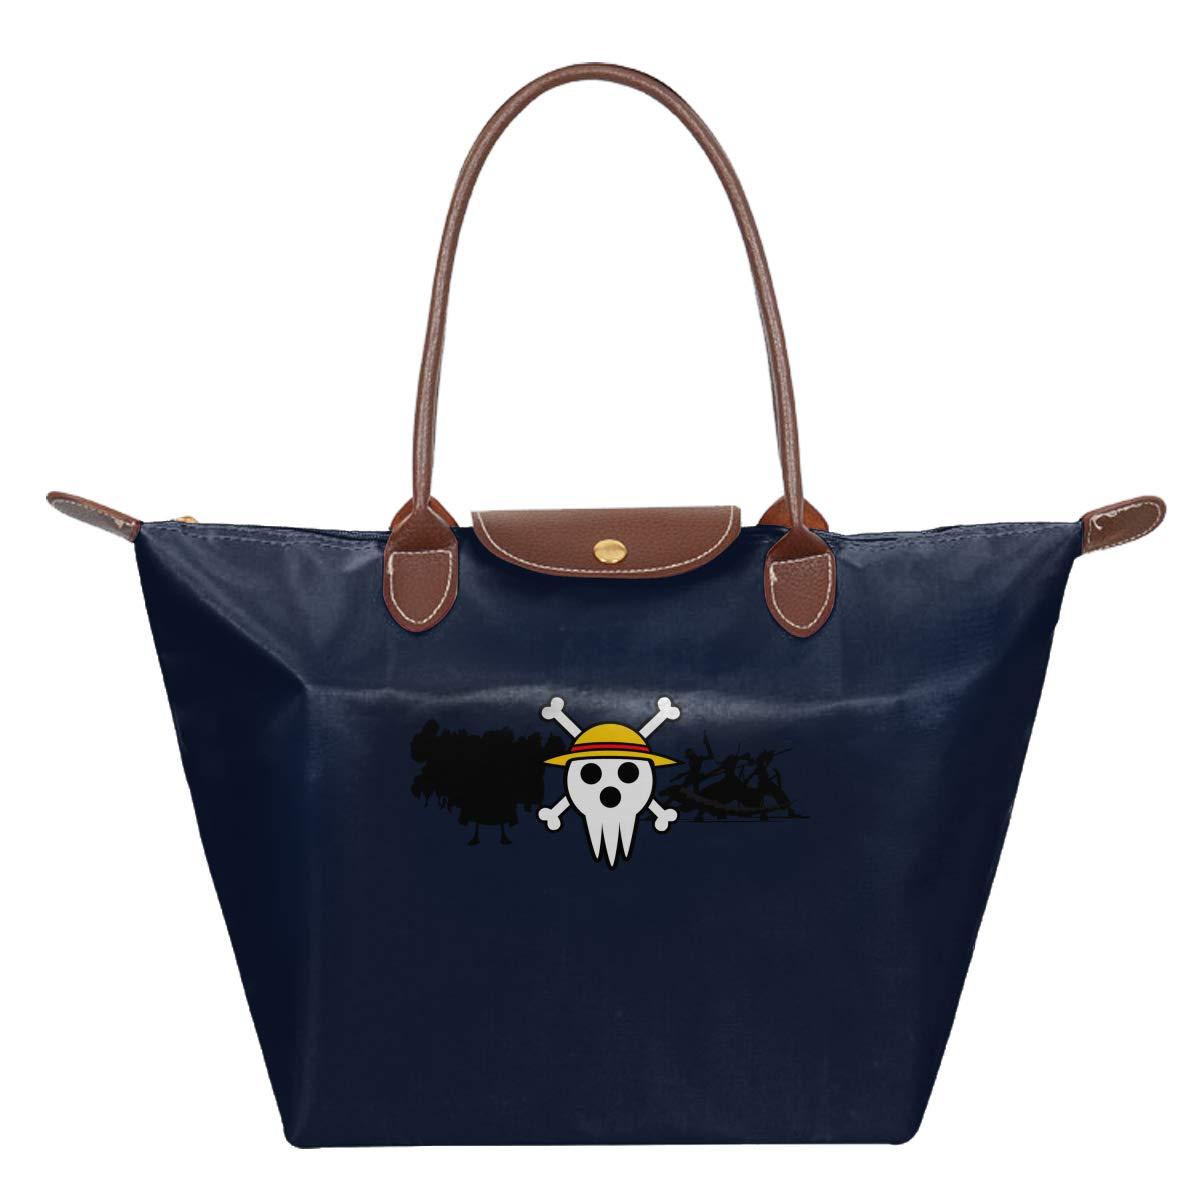 One Piece Skull Flag Luffy Waterproof Leather Folded Messenger Nylon Bag Travel Tote Hopping Folding School Handbags